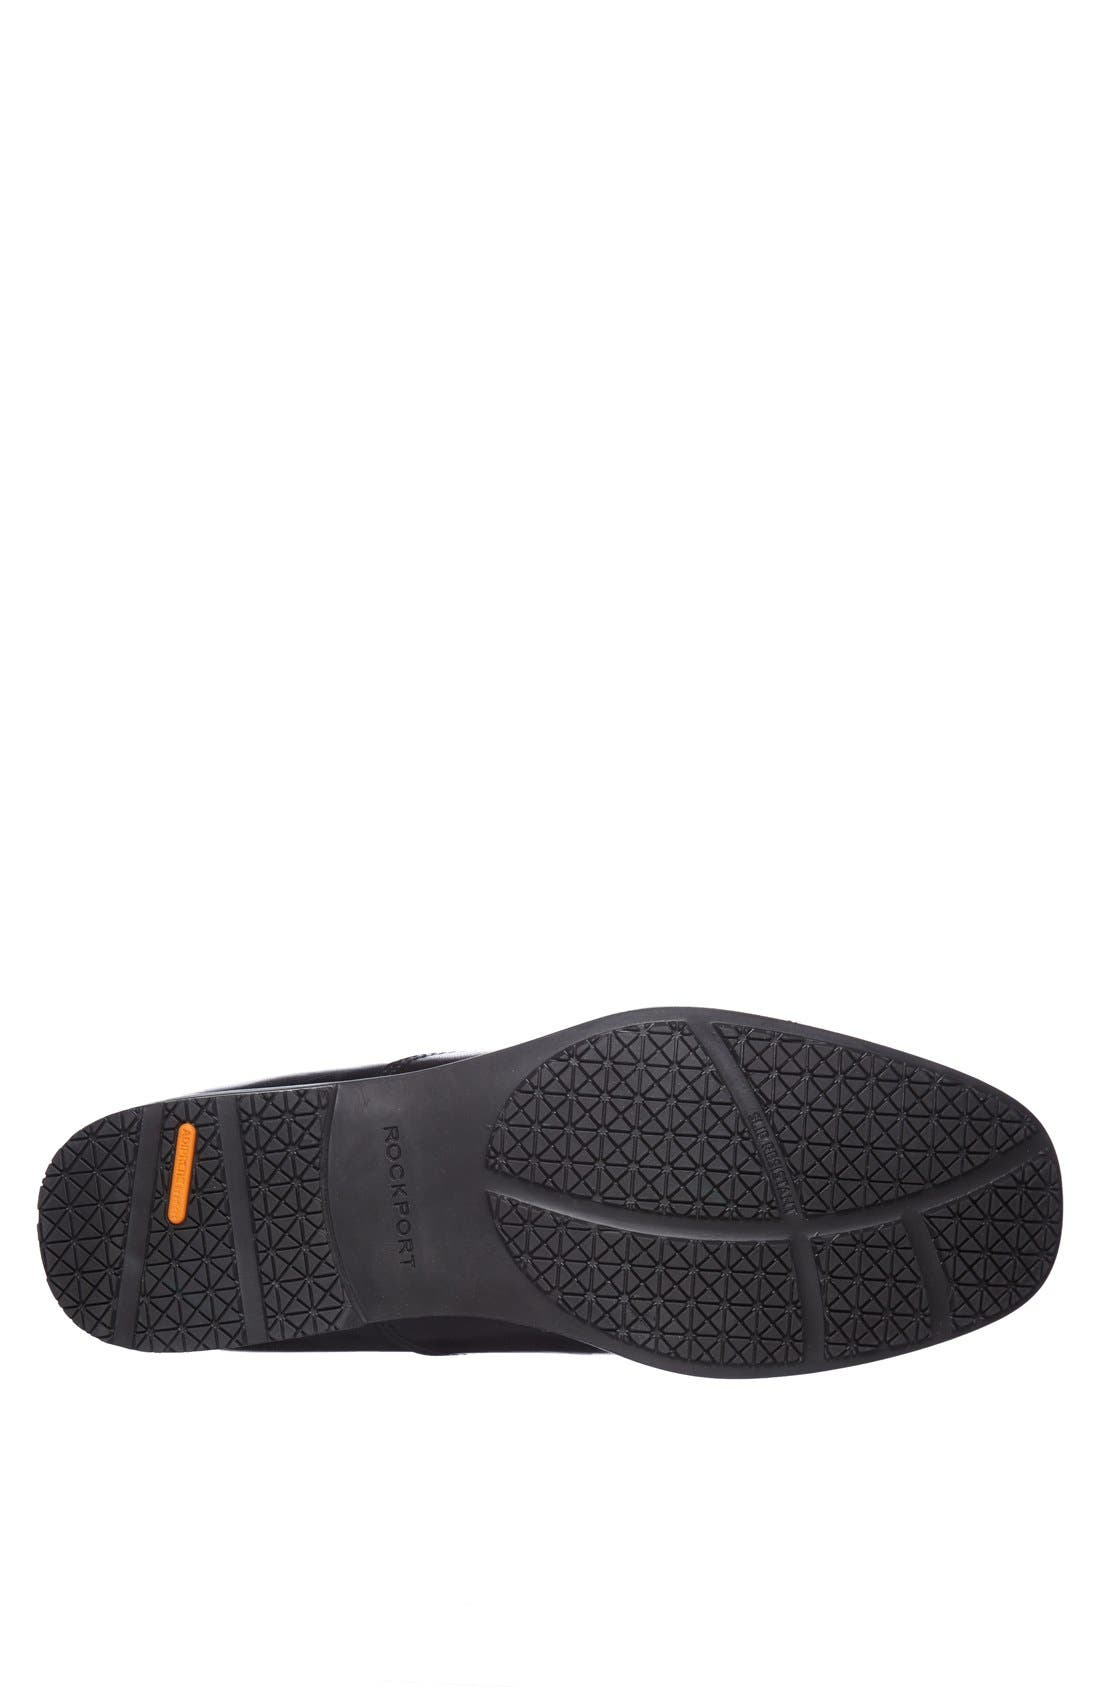 'Essential Details' Waterproof Loafer,                             Alternate thumbnail 5, color,